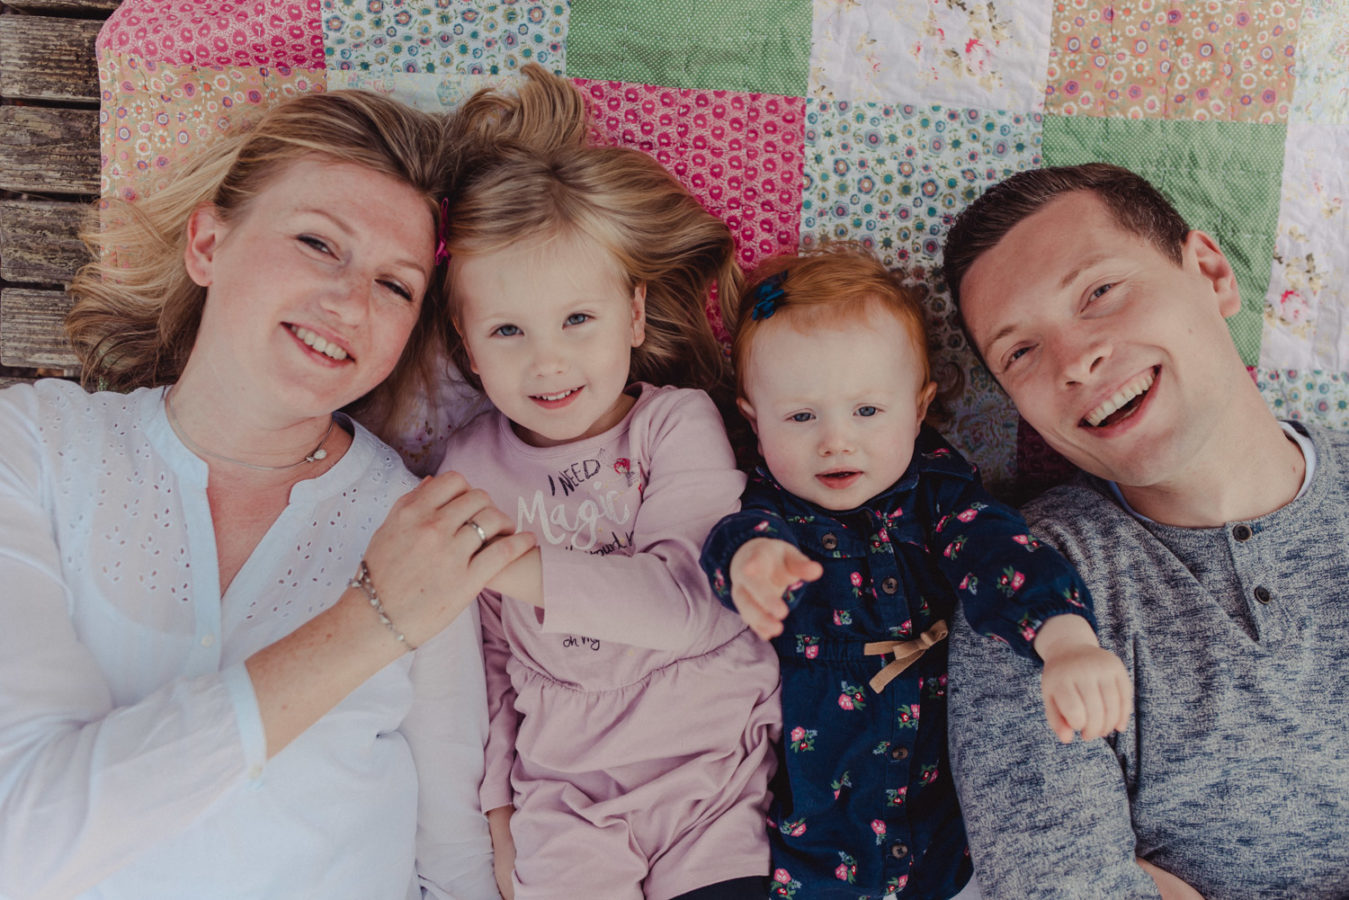 Familienshooting-köln-familienbilder-bonn-düsseldorf-fotograf-1